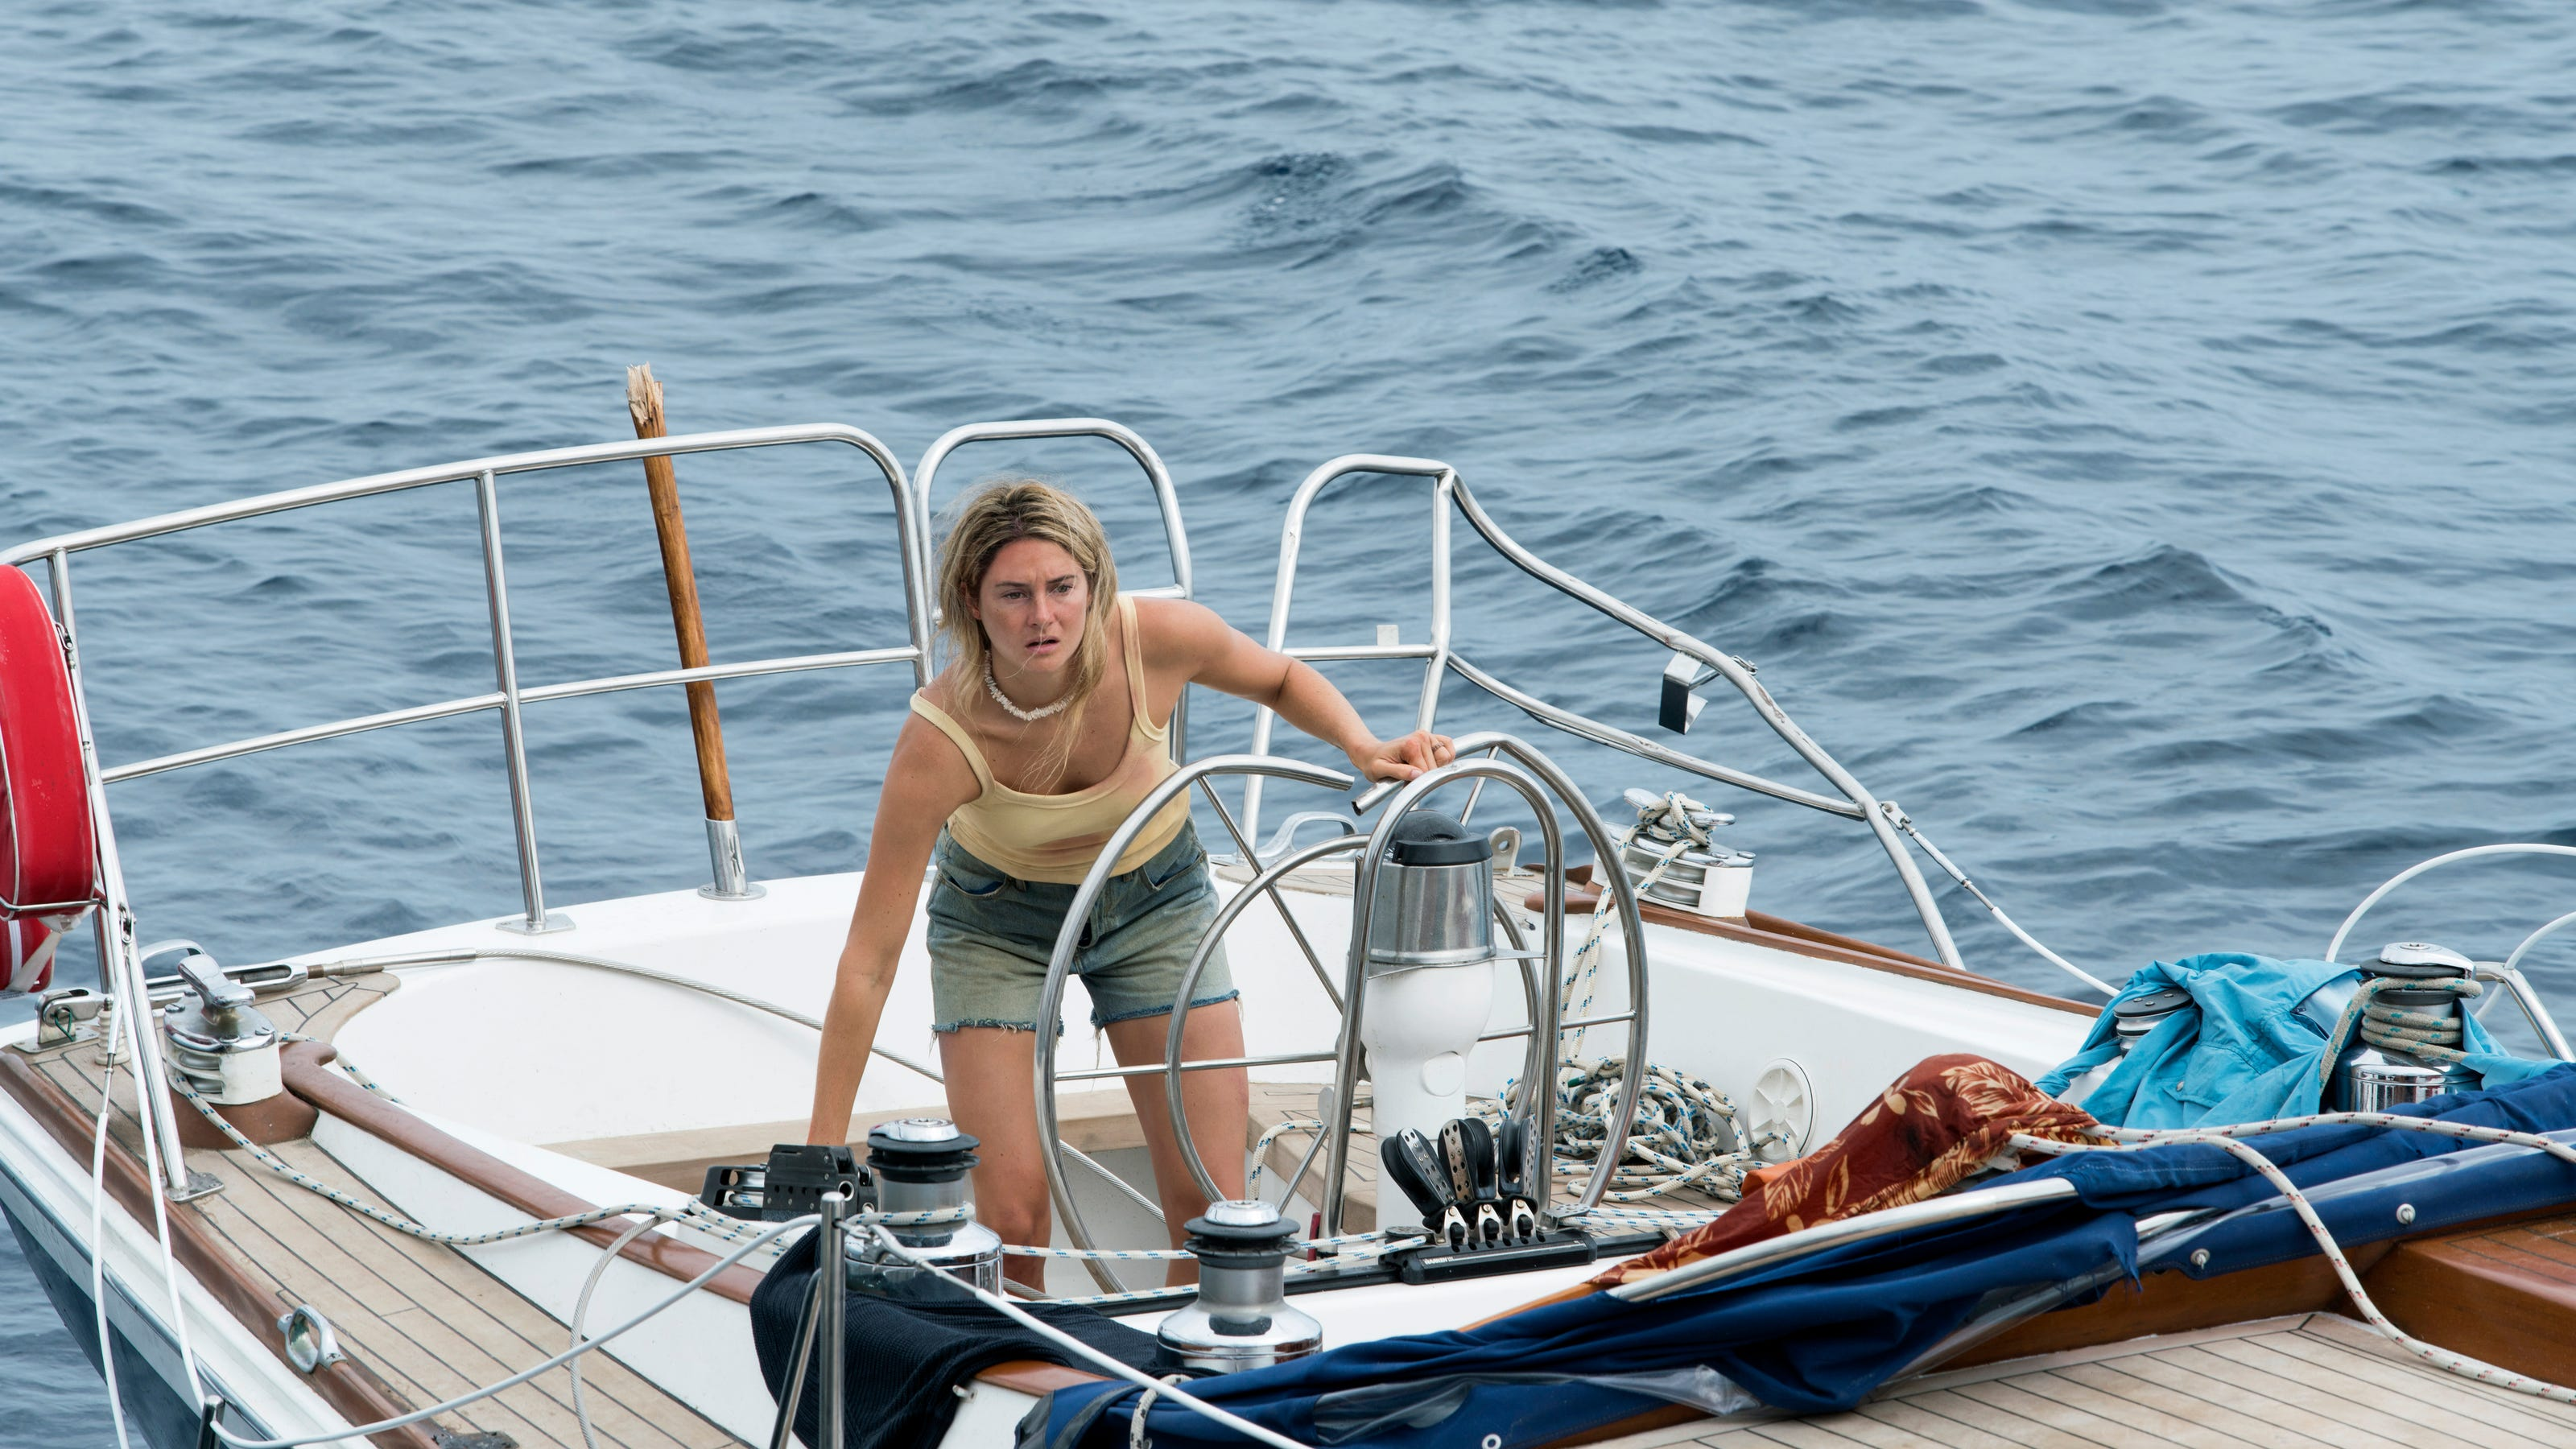 Trailer Shailene Woodley And Sam Claflin Hit Rough Seas In Adrift